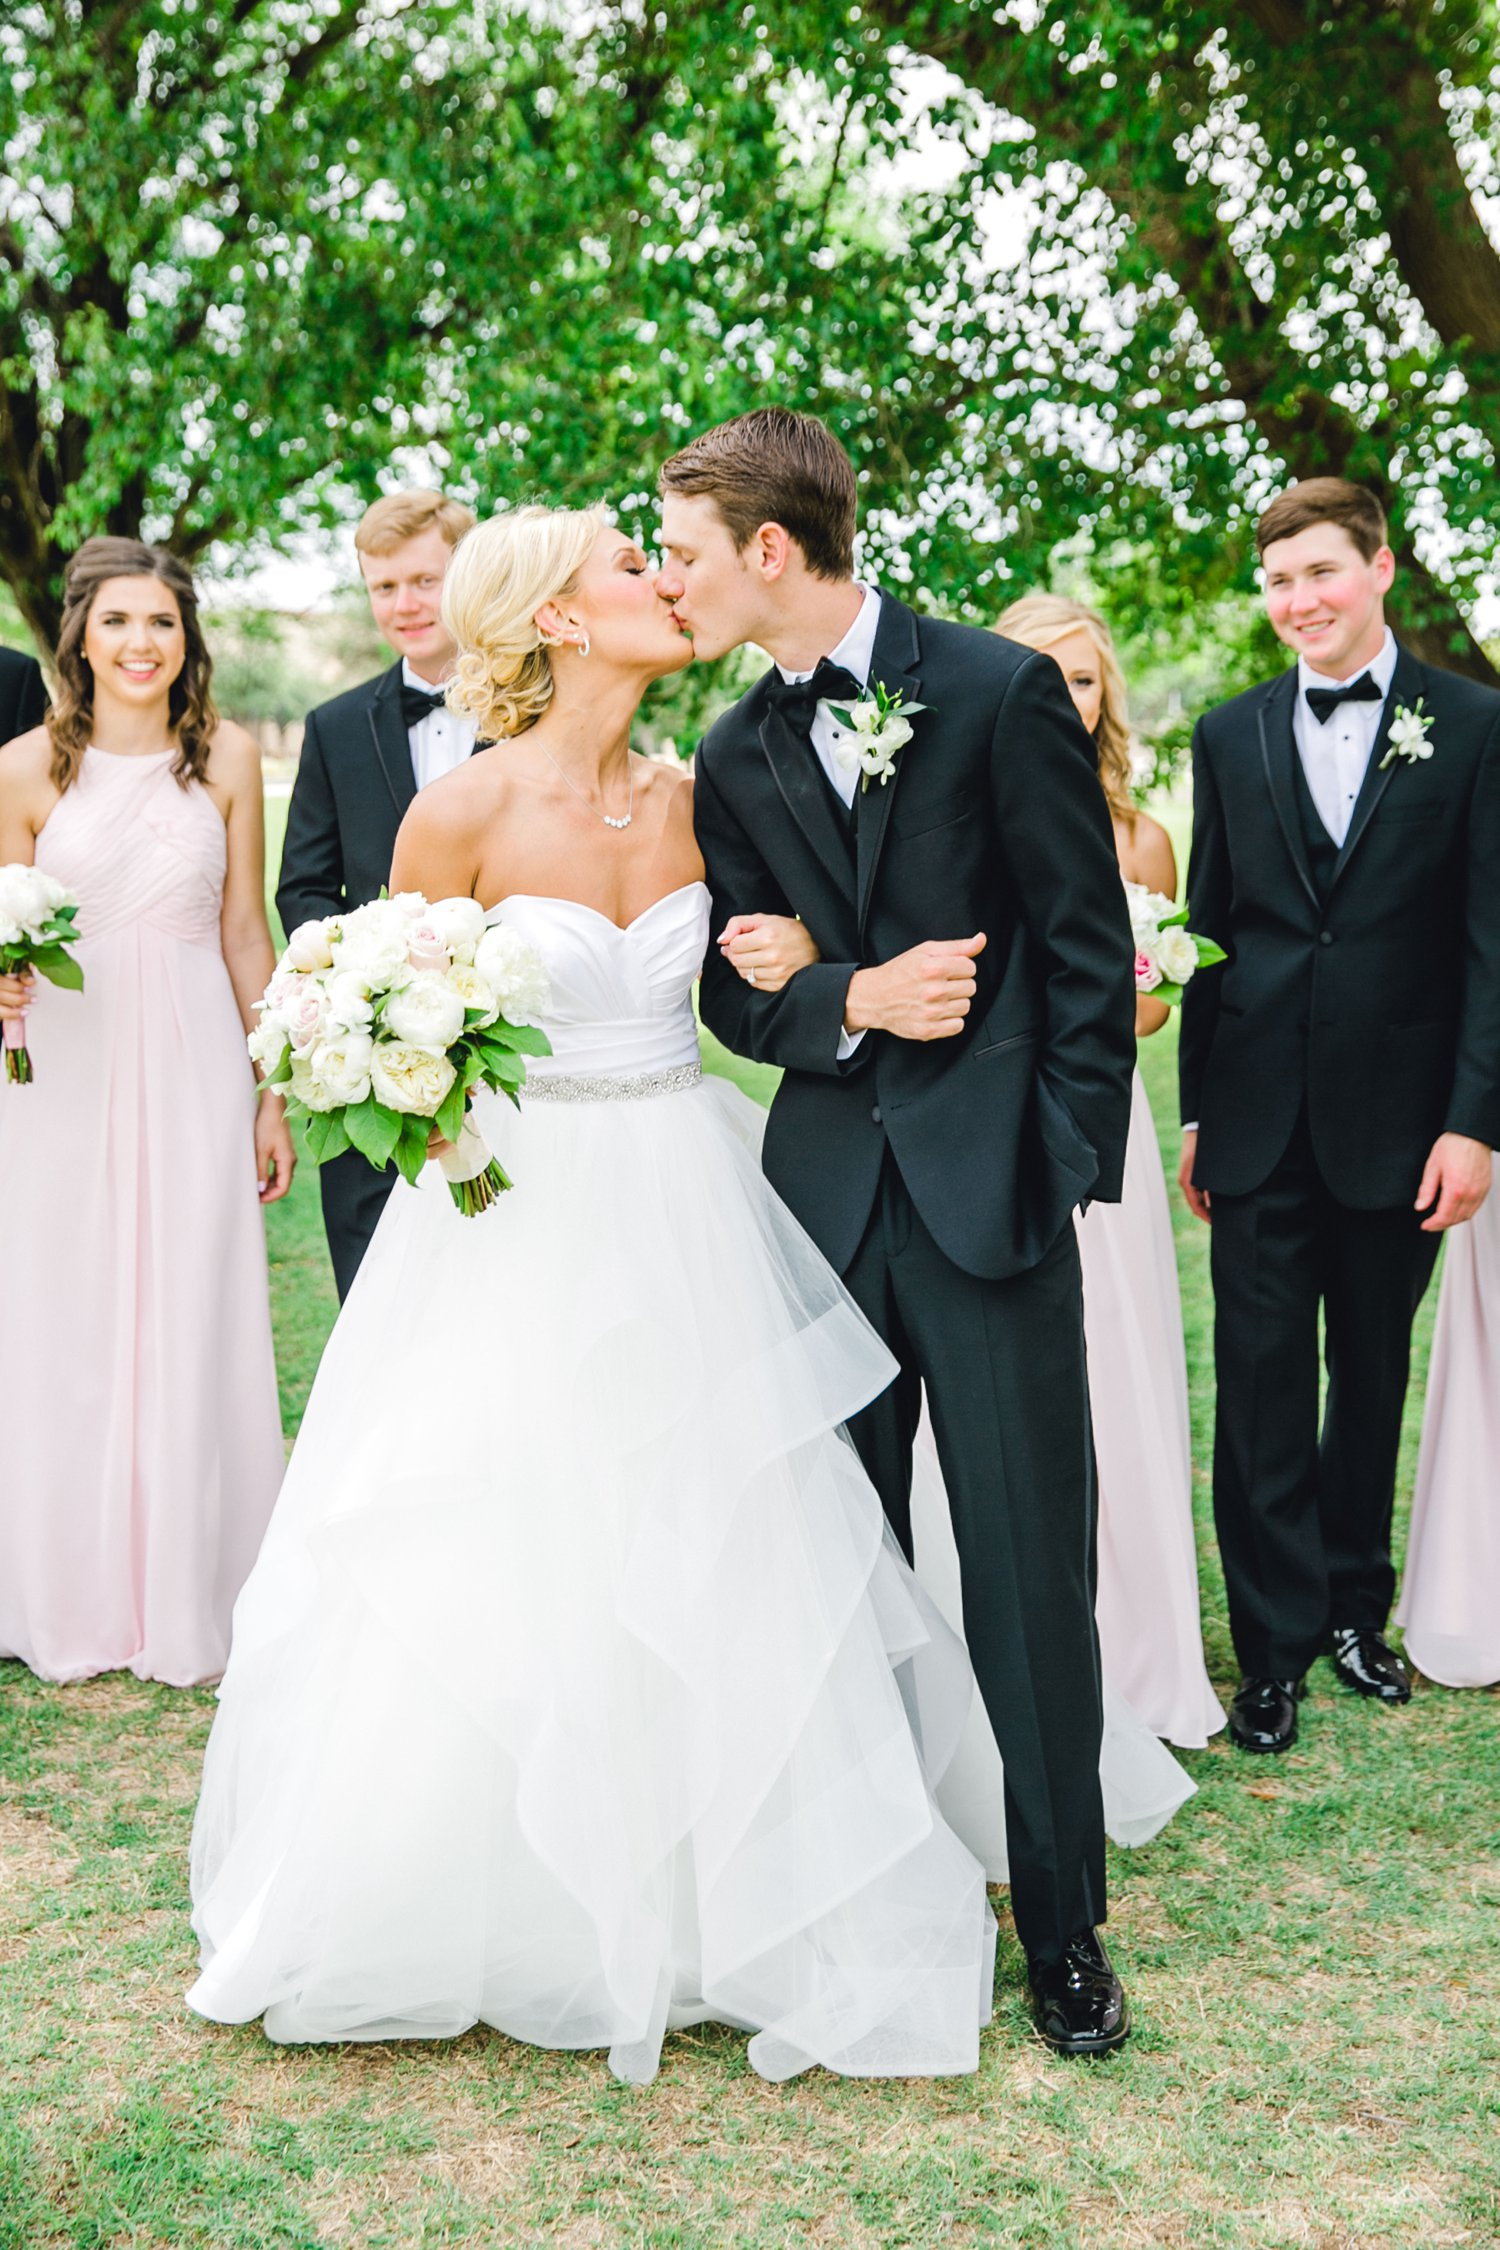 Taylor-and-Brock-Williams-Texas-Tech-University-Merket-Alumni-Center-Lubbock-Photographer-ALLEEJ0081.jpg